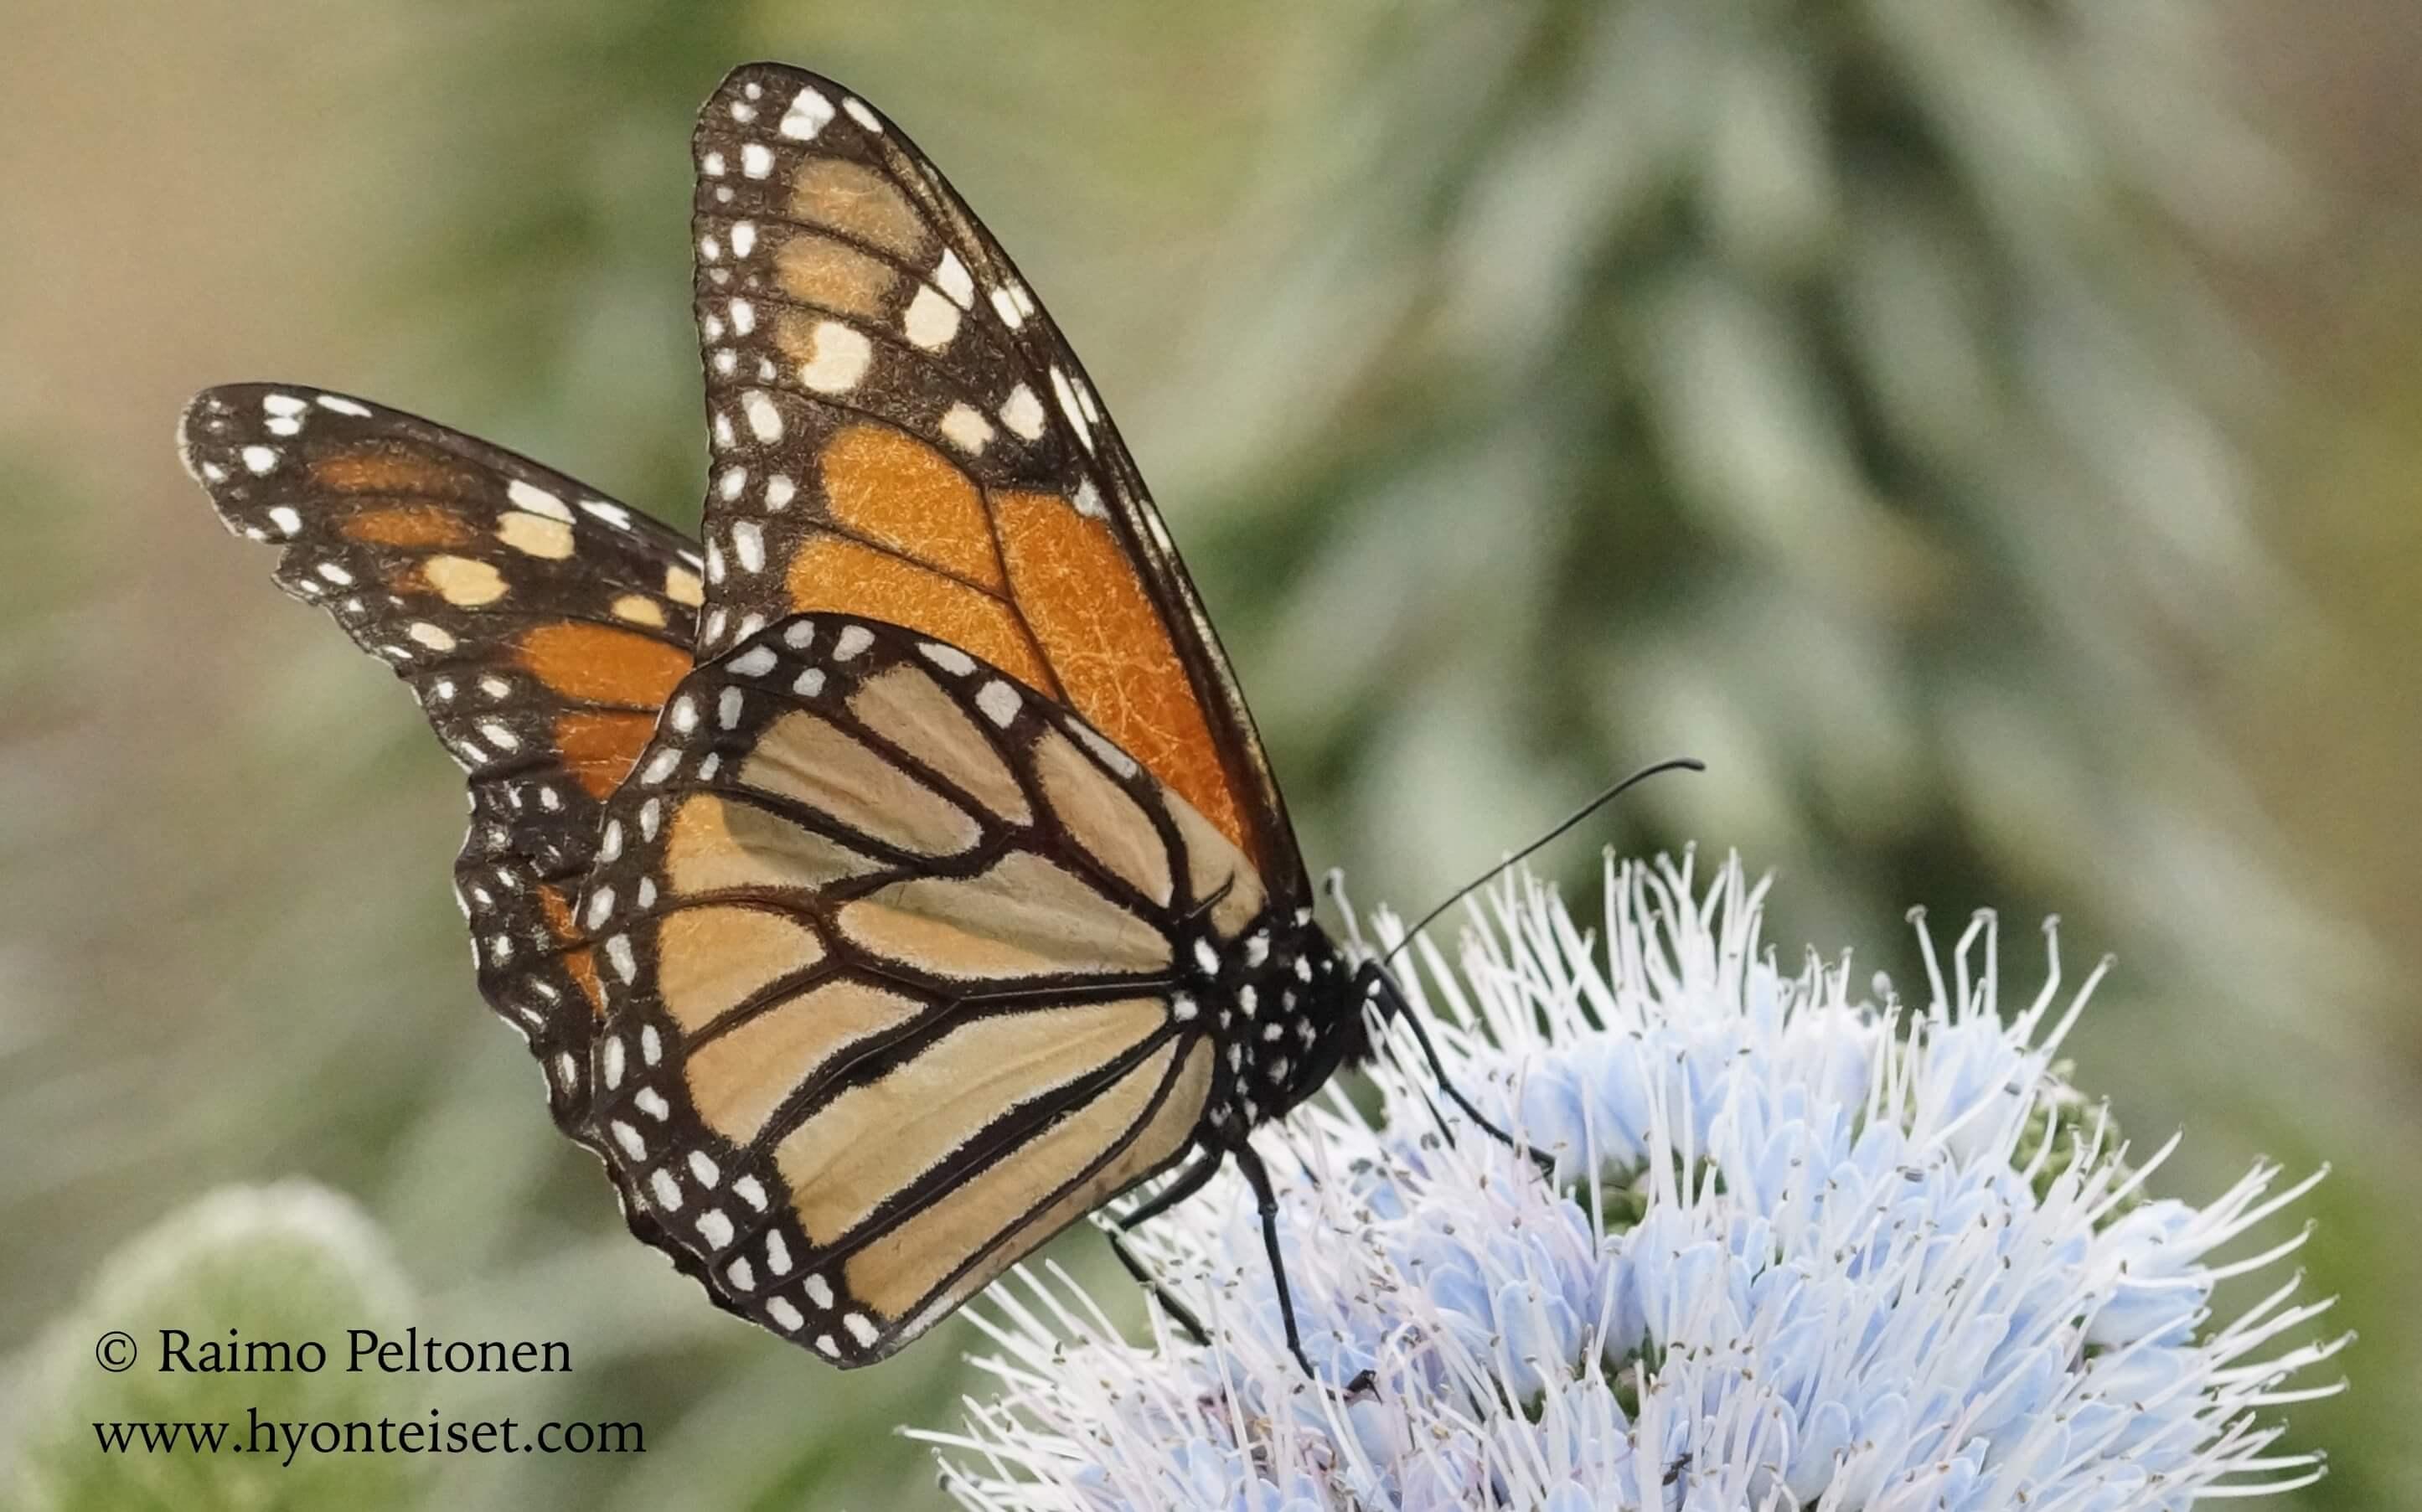 Danaus plexippus-monarkki (Nymphalidae) MADEIRA